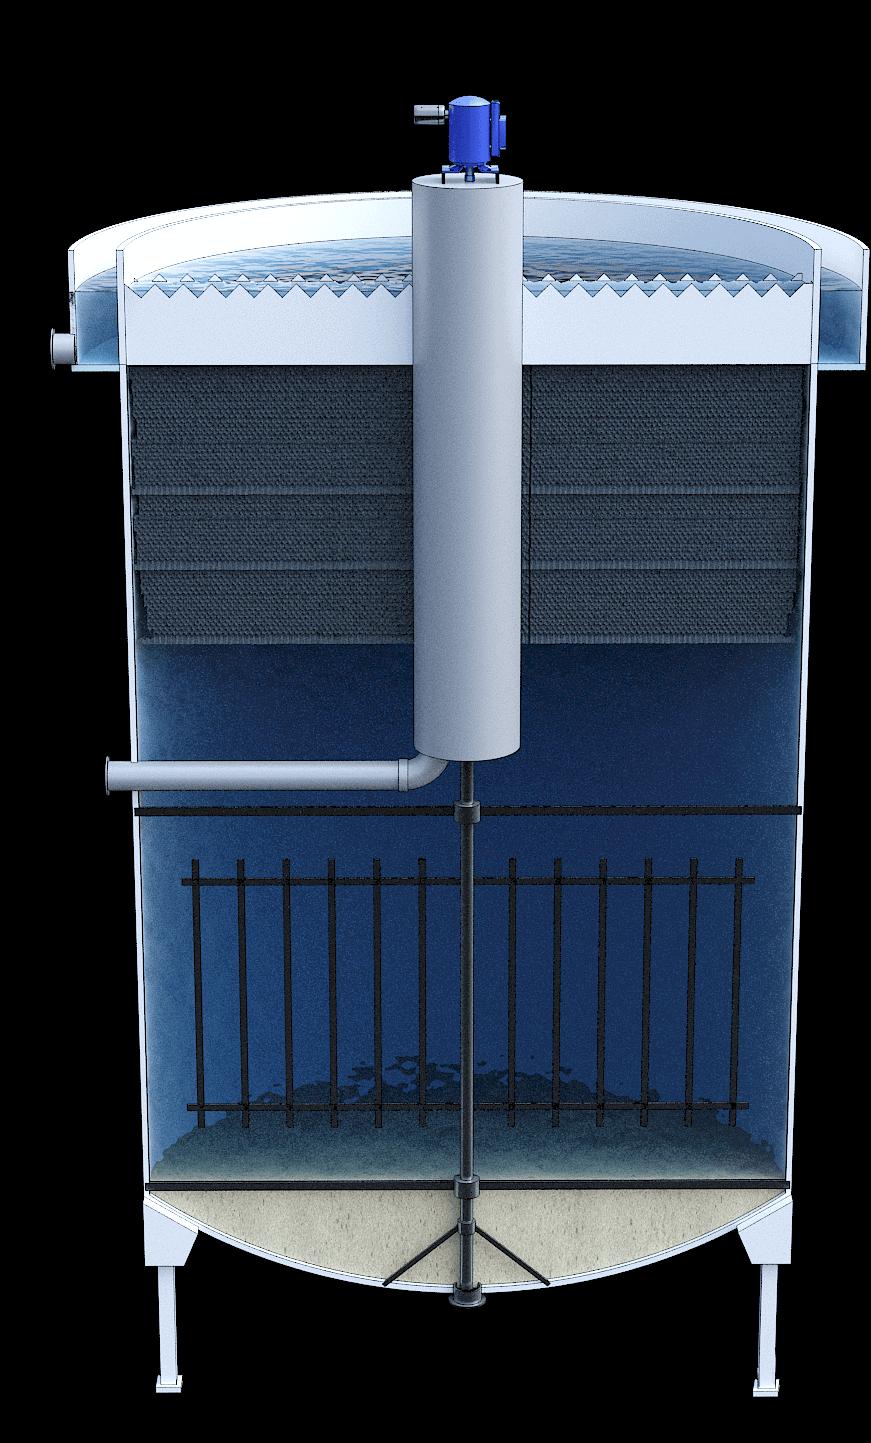 Sedimentadores lamelares cilíndricos 2